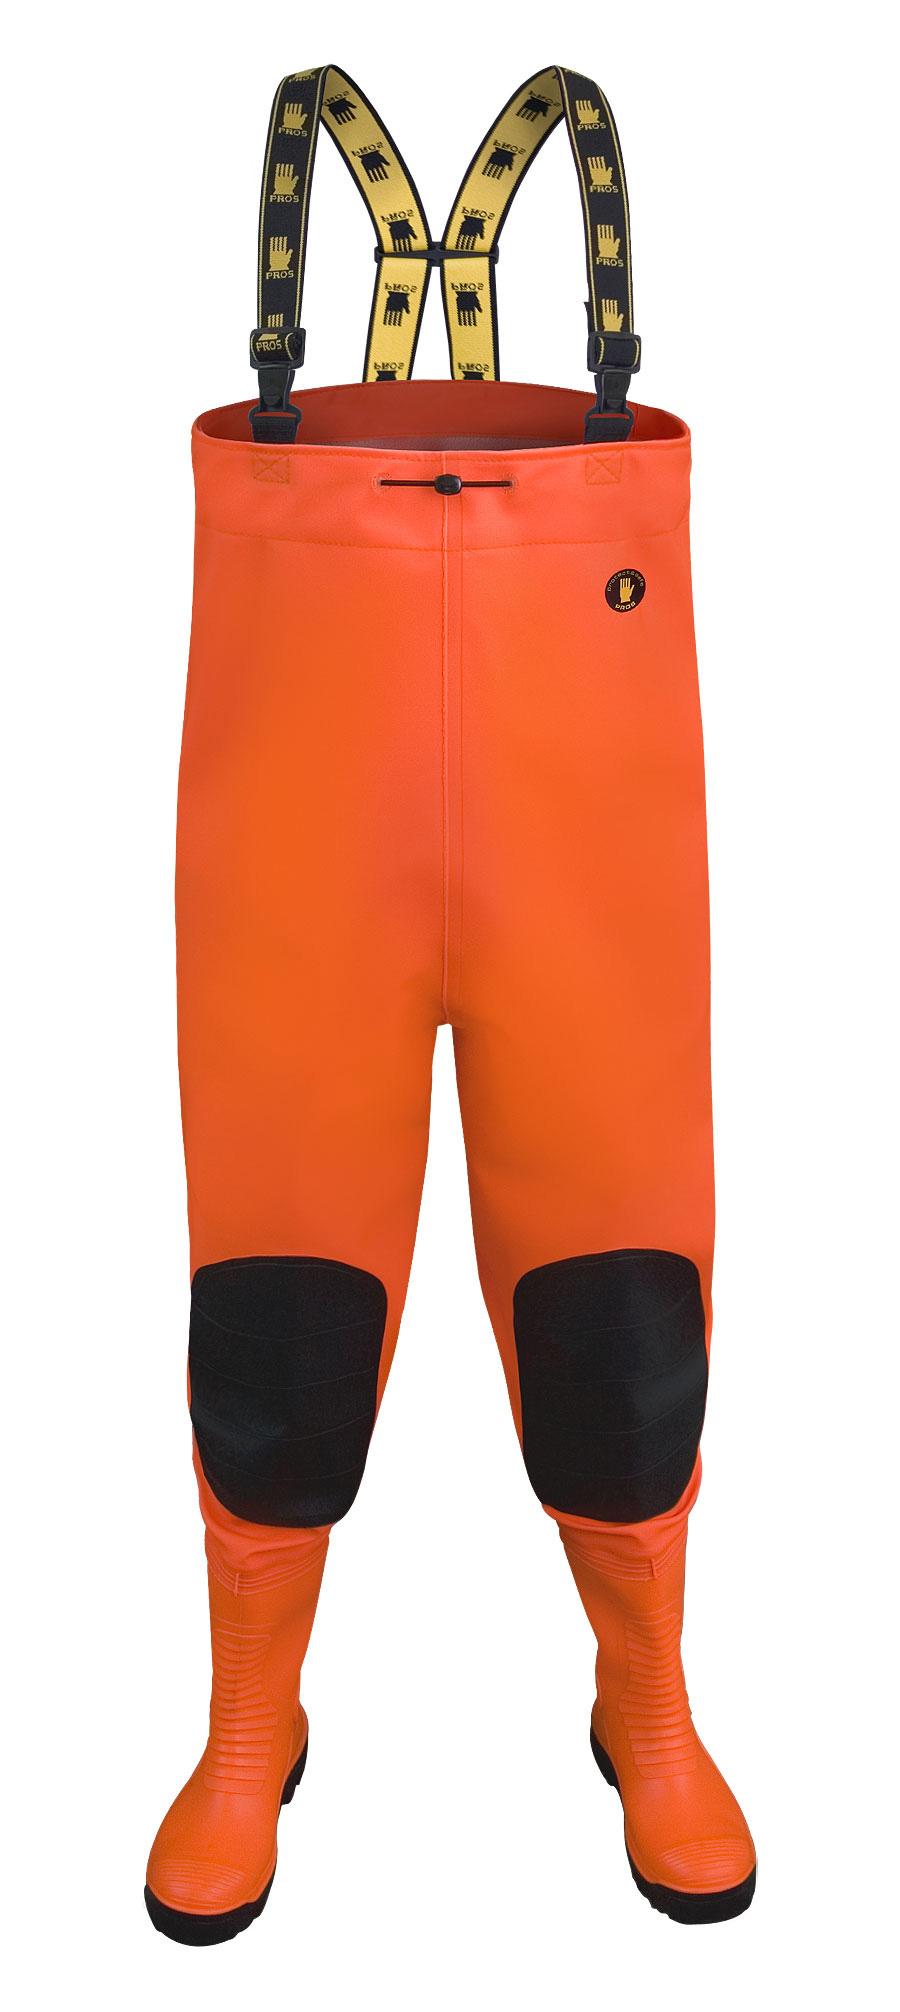 Brodící kalhoty MAX Fluo oranž vel.44    SBM01 Fluo or.  PROS